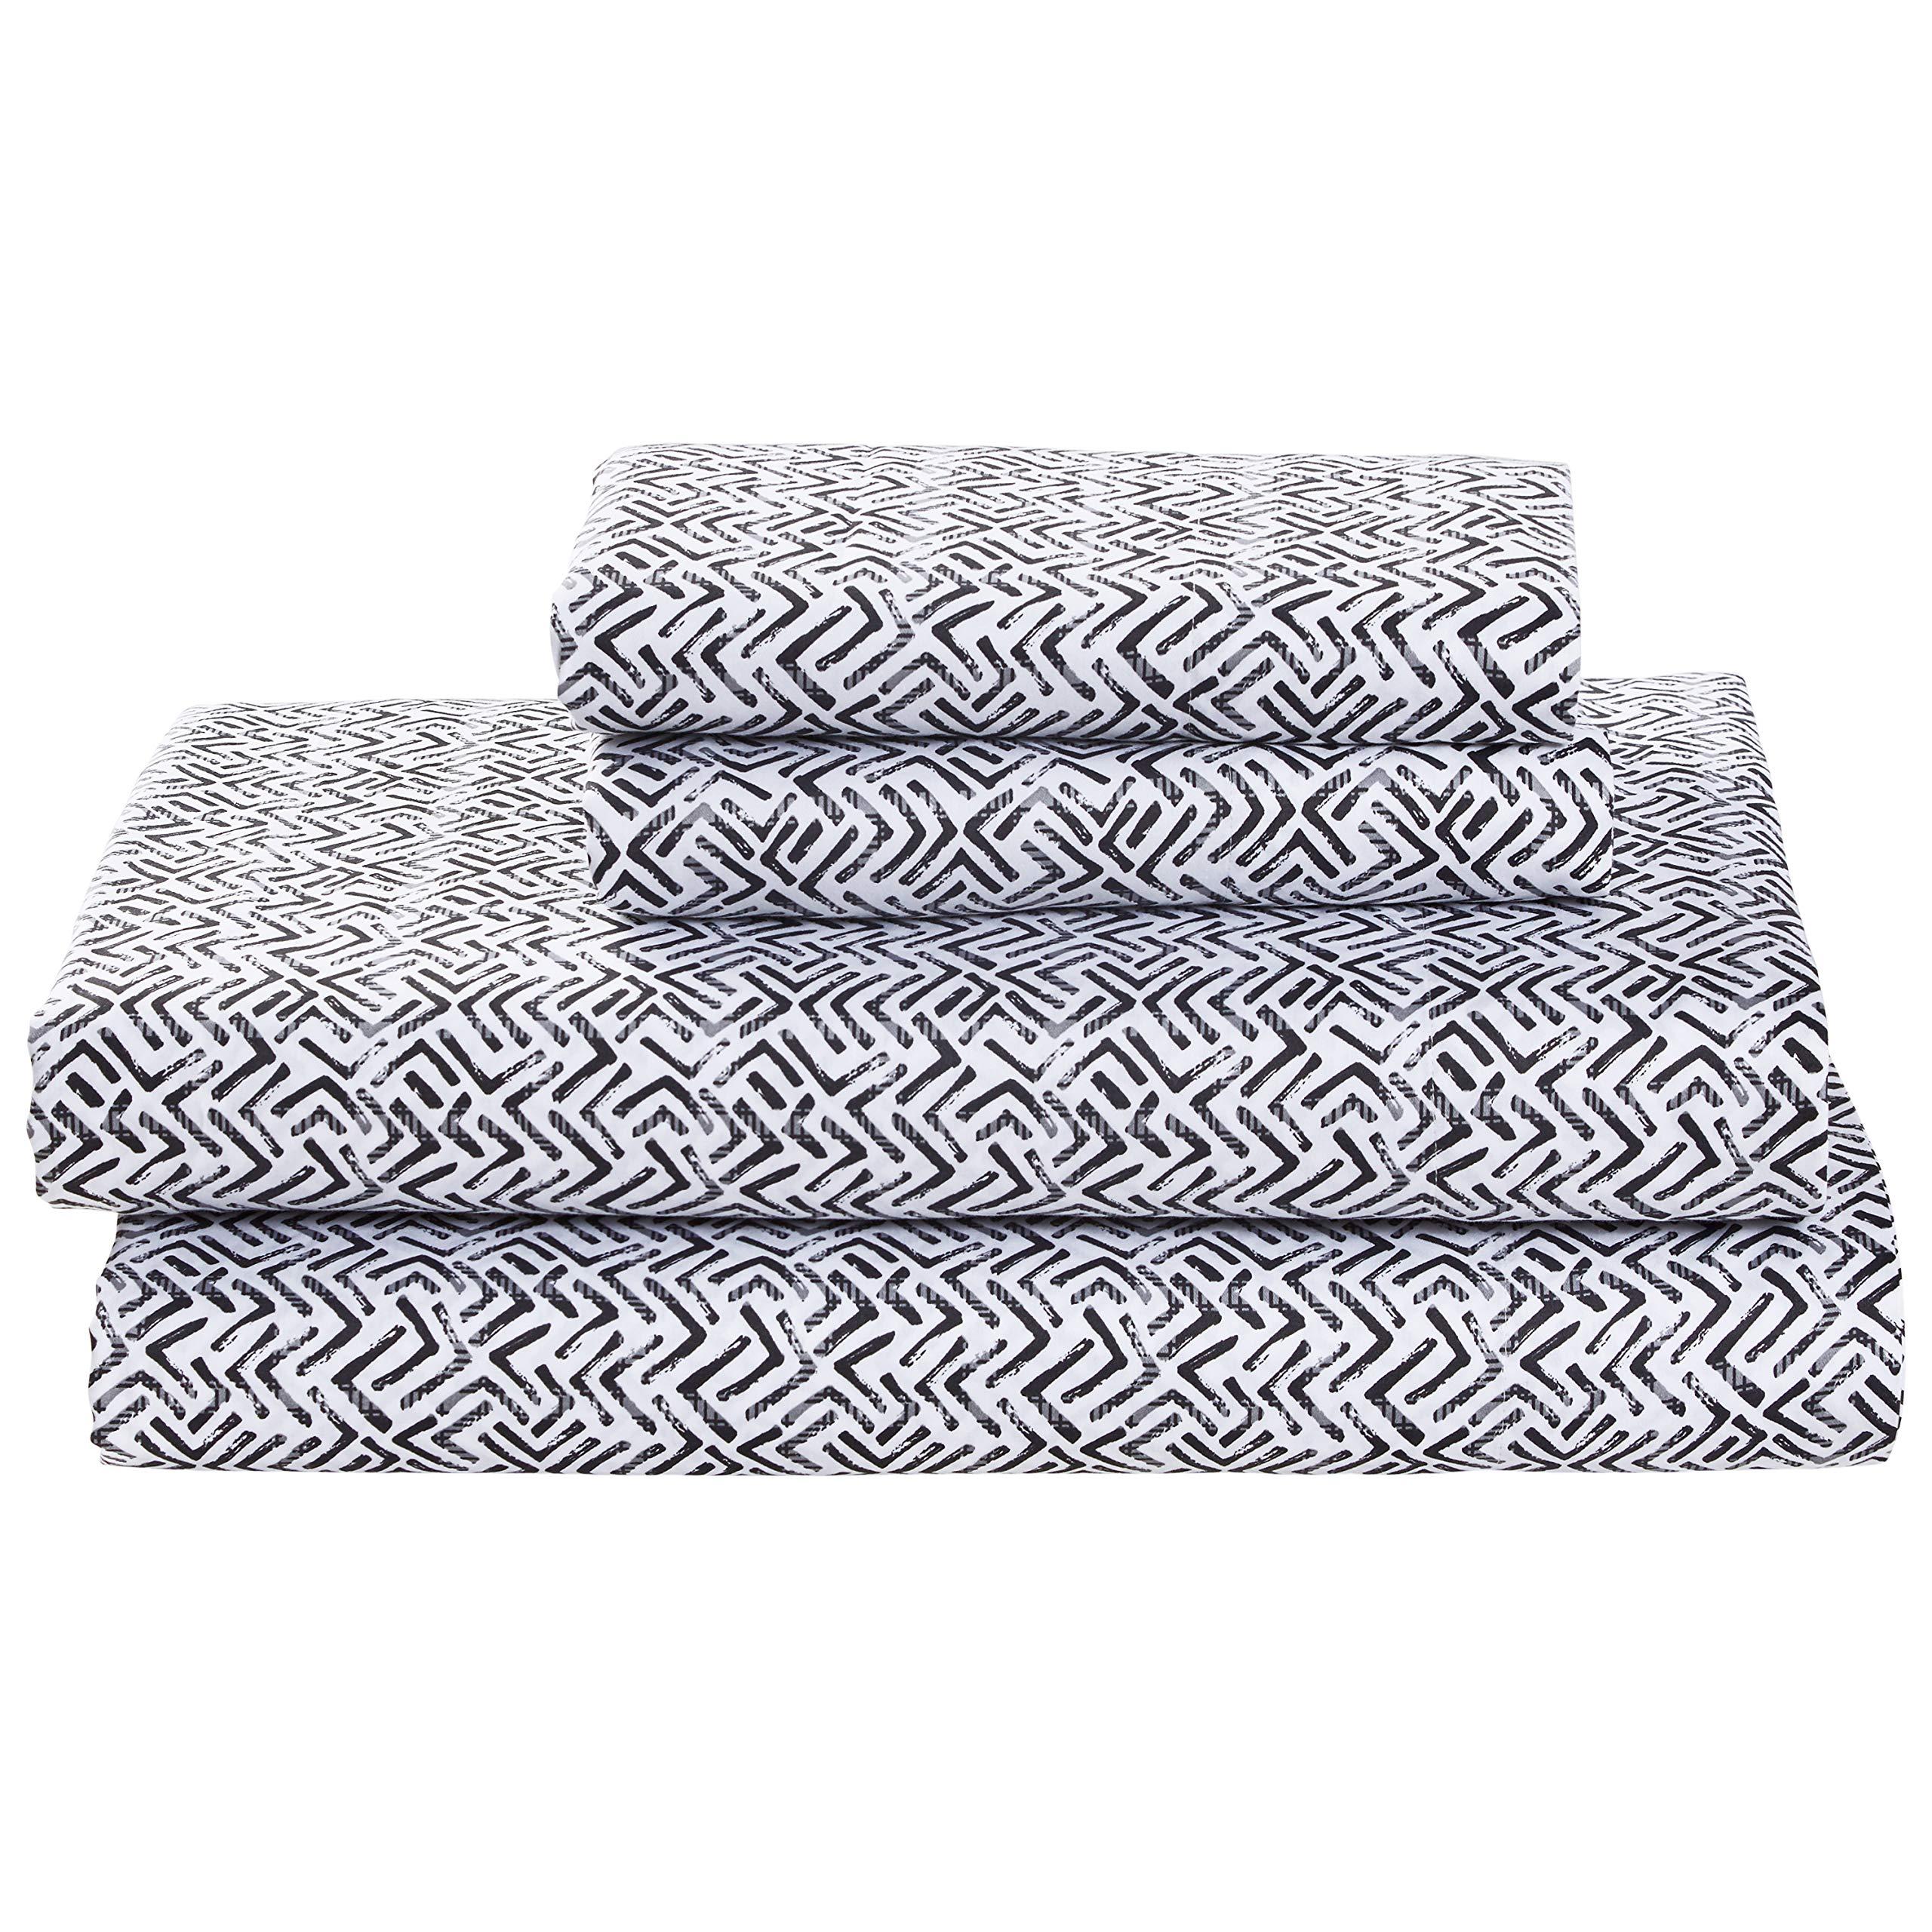 Rivet Boomerang Sateen 100% Cotton Bed Sheet Set, King, Graphite Grey